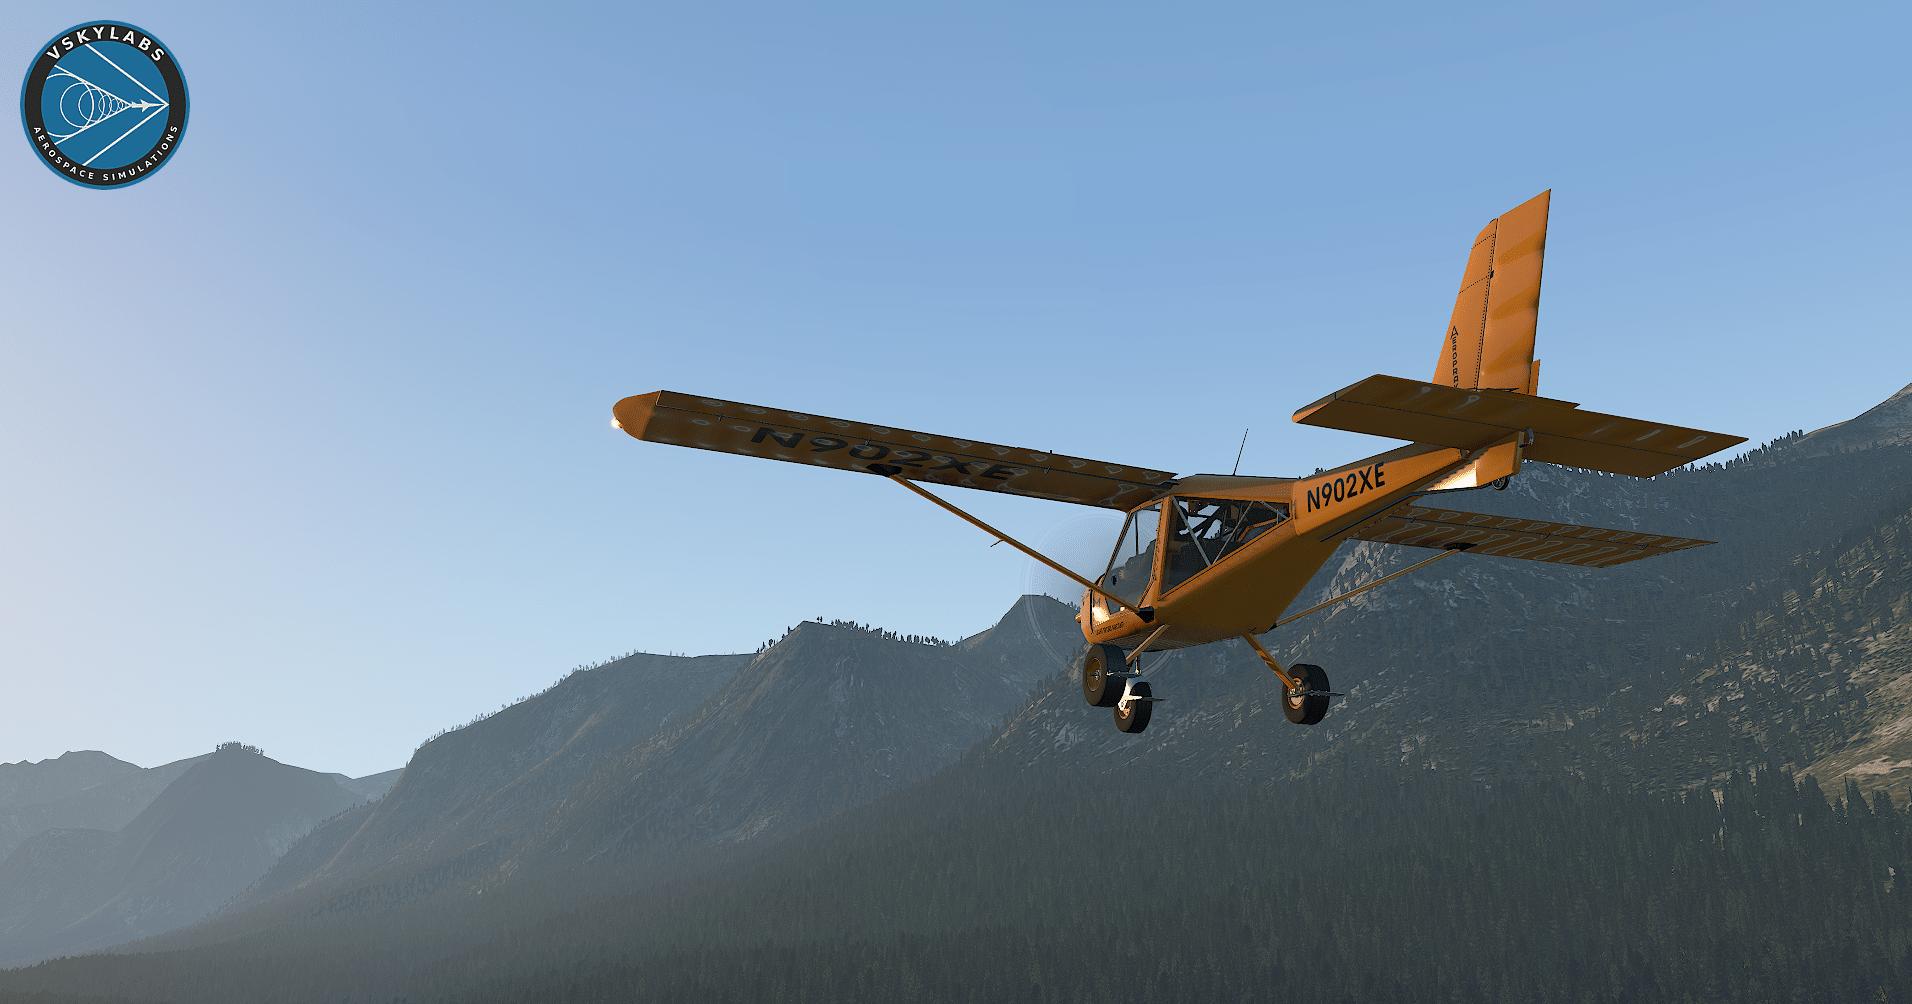 vskylabs-aeroprakt-a22-ls-v1.0-020